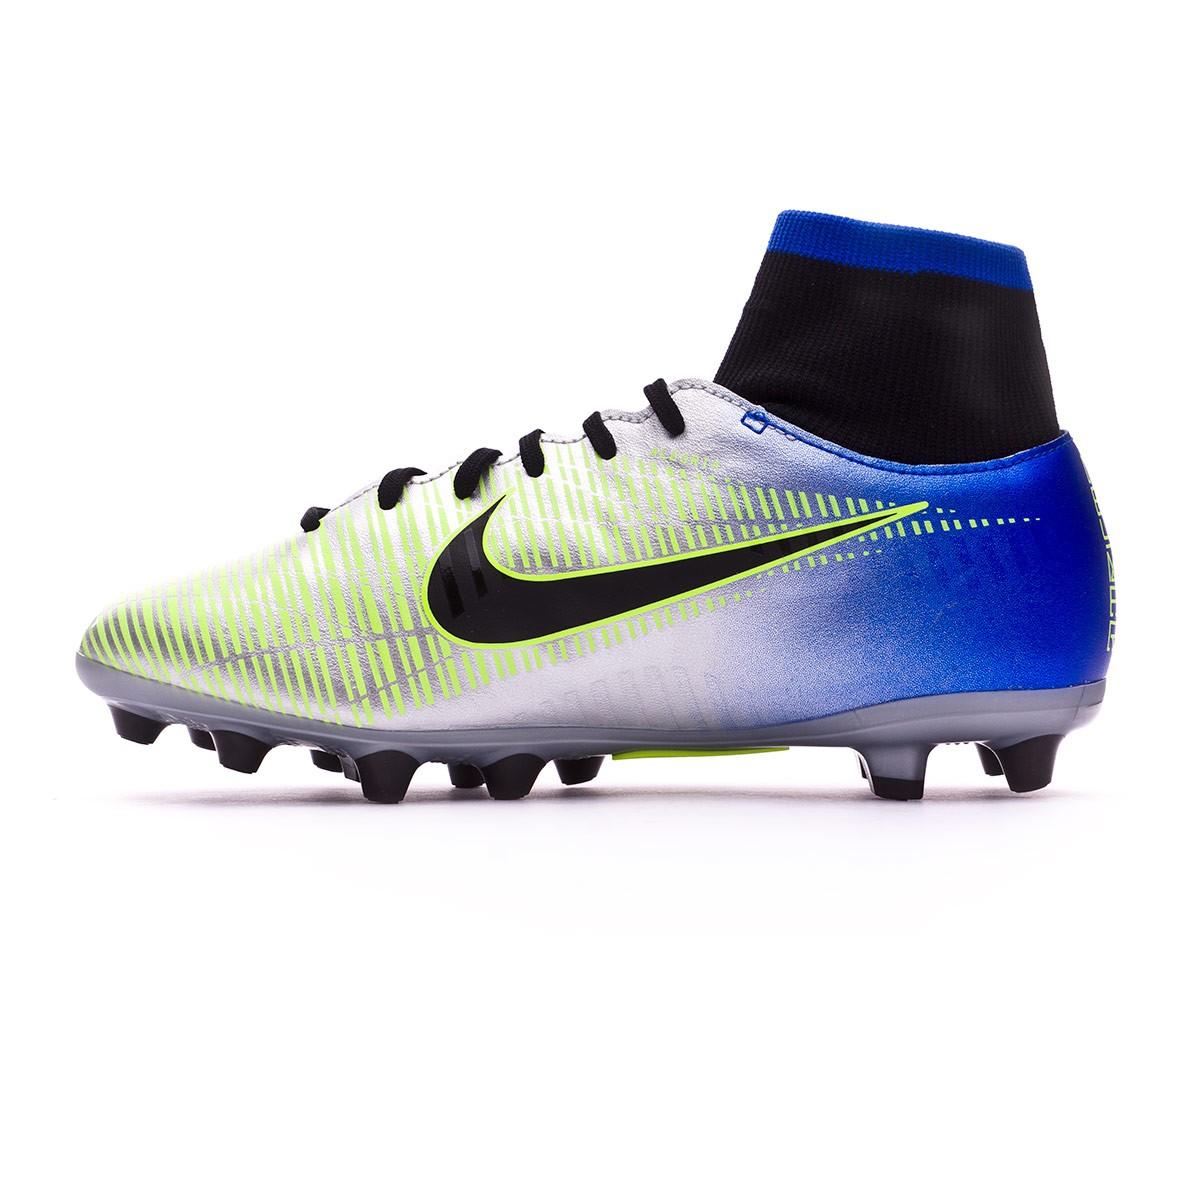 Bota de fútbol Nike Mercurial Victory VI DF AG-Pro Neymar Niño Racer  blue-Black-Chrome-Volt - Soloporteros es ahora Fútbol Emotion 92569239c1c